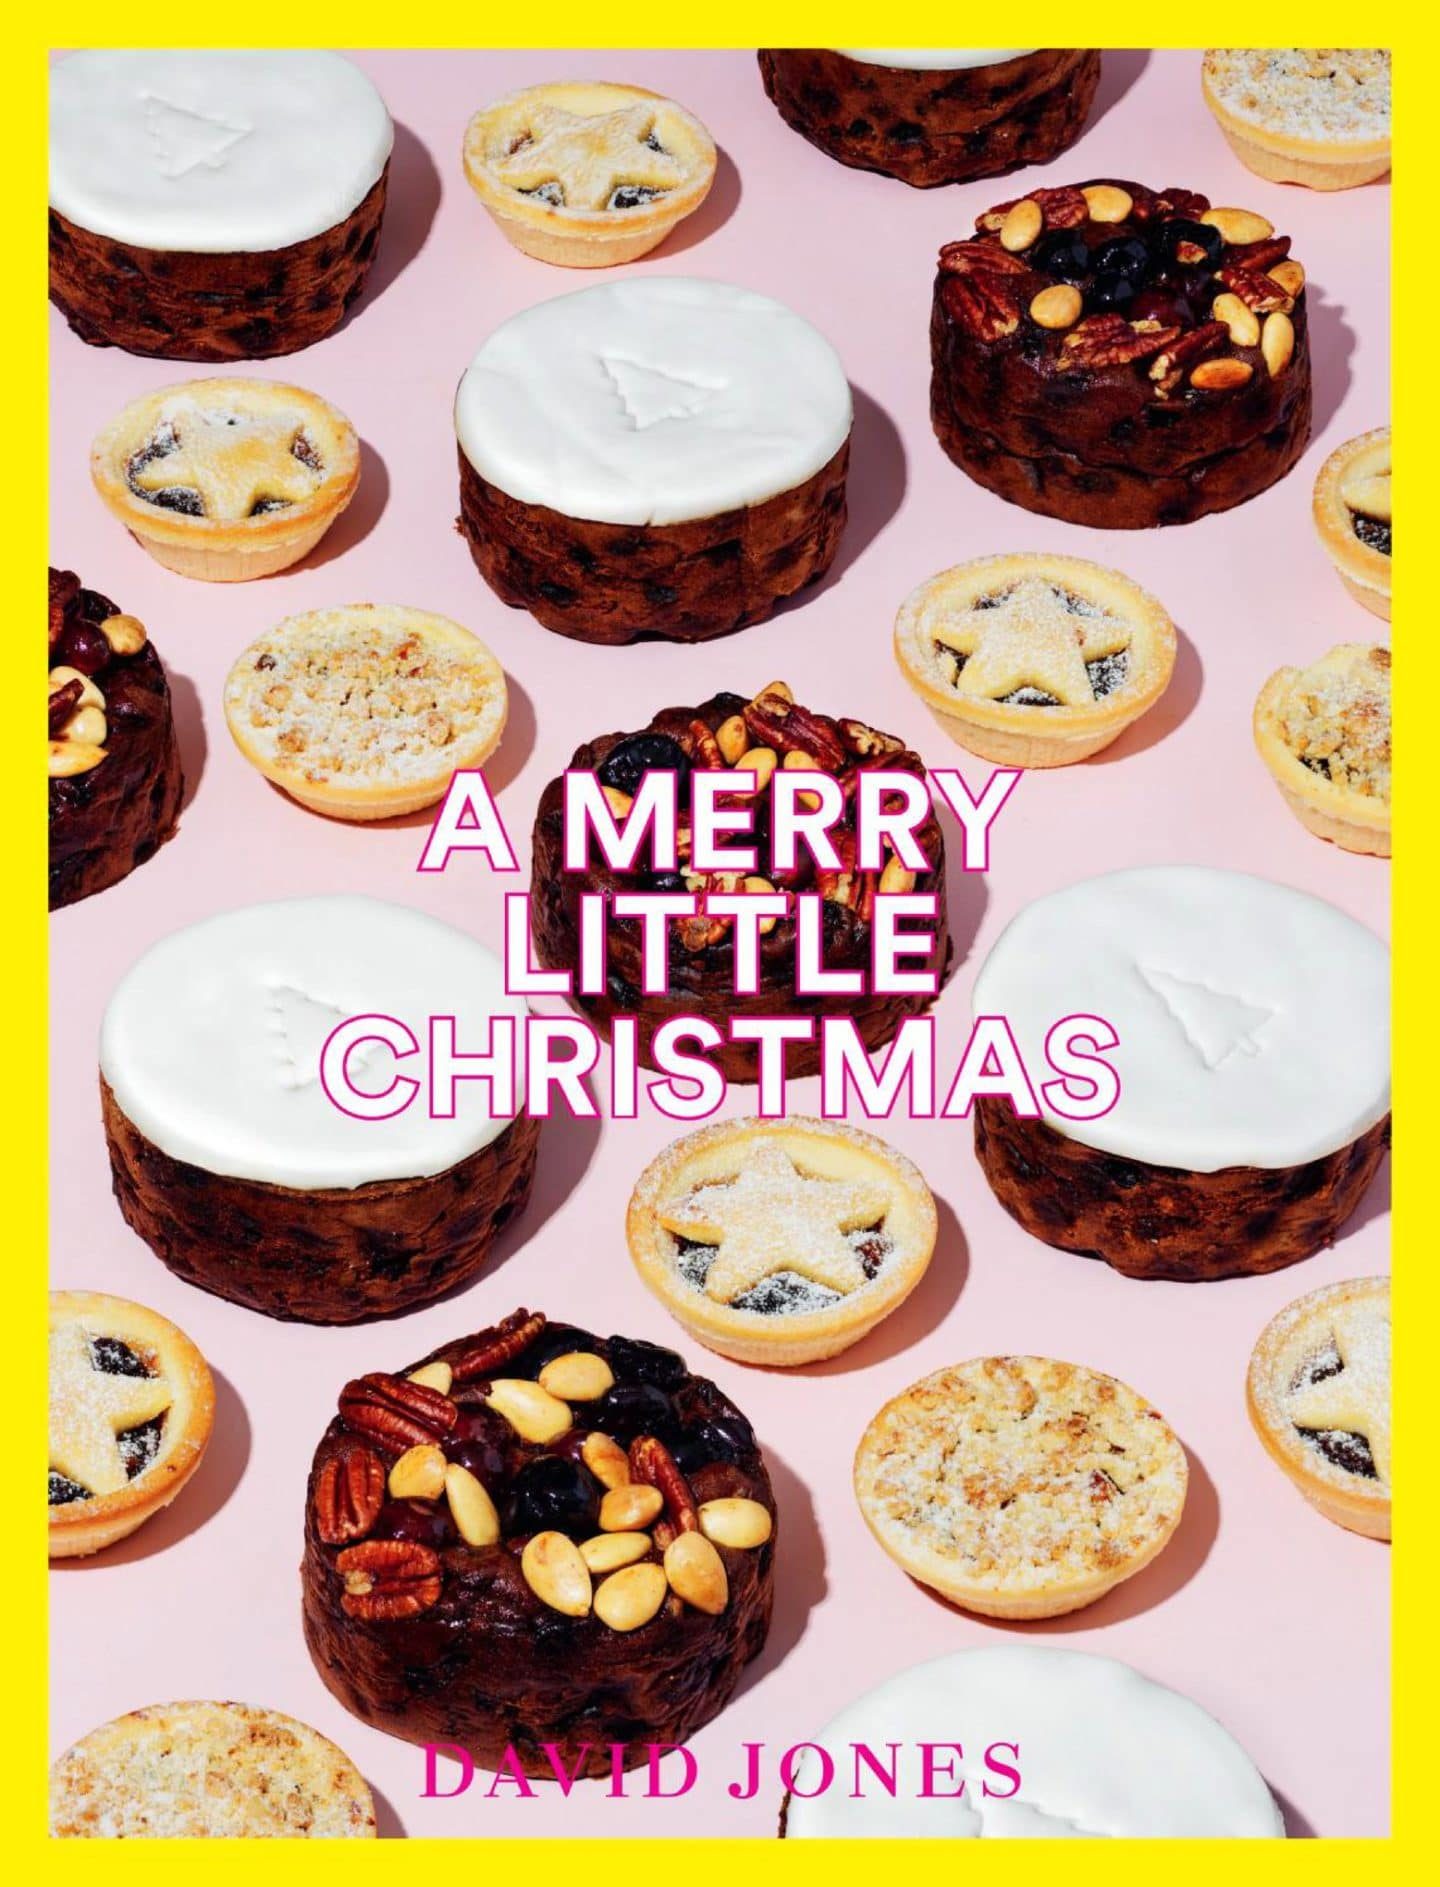 David Jones Catalogue 31 October -24 November 2019. Christmas Trim Hamper Food Supplement